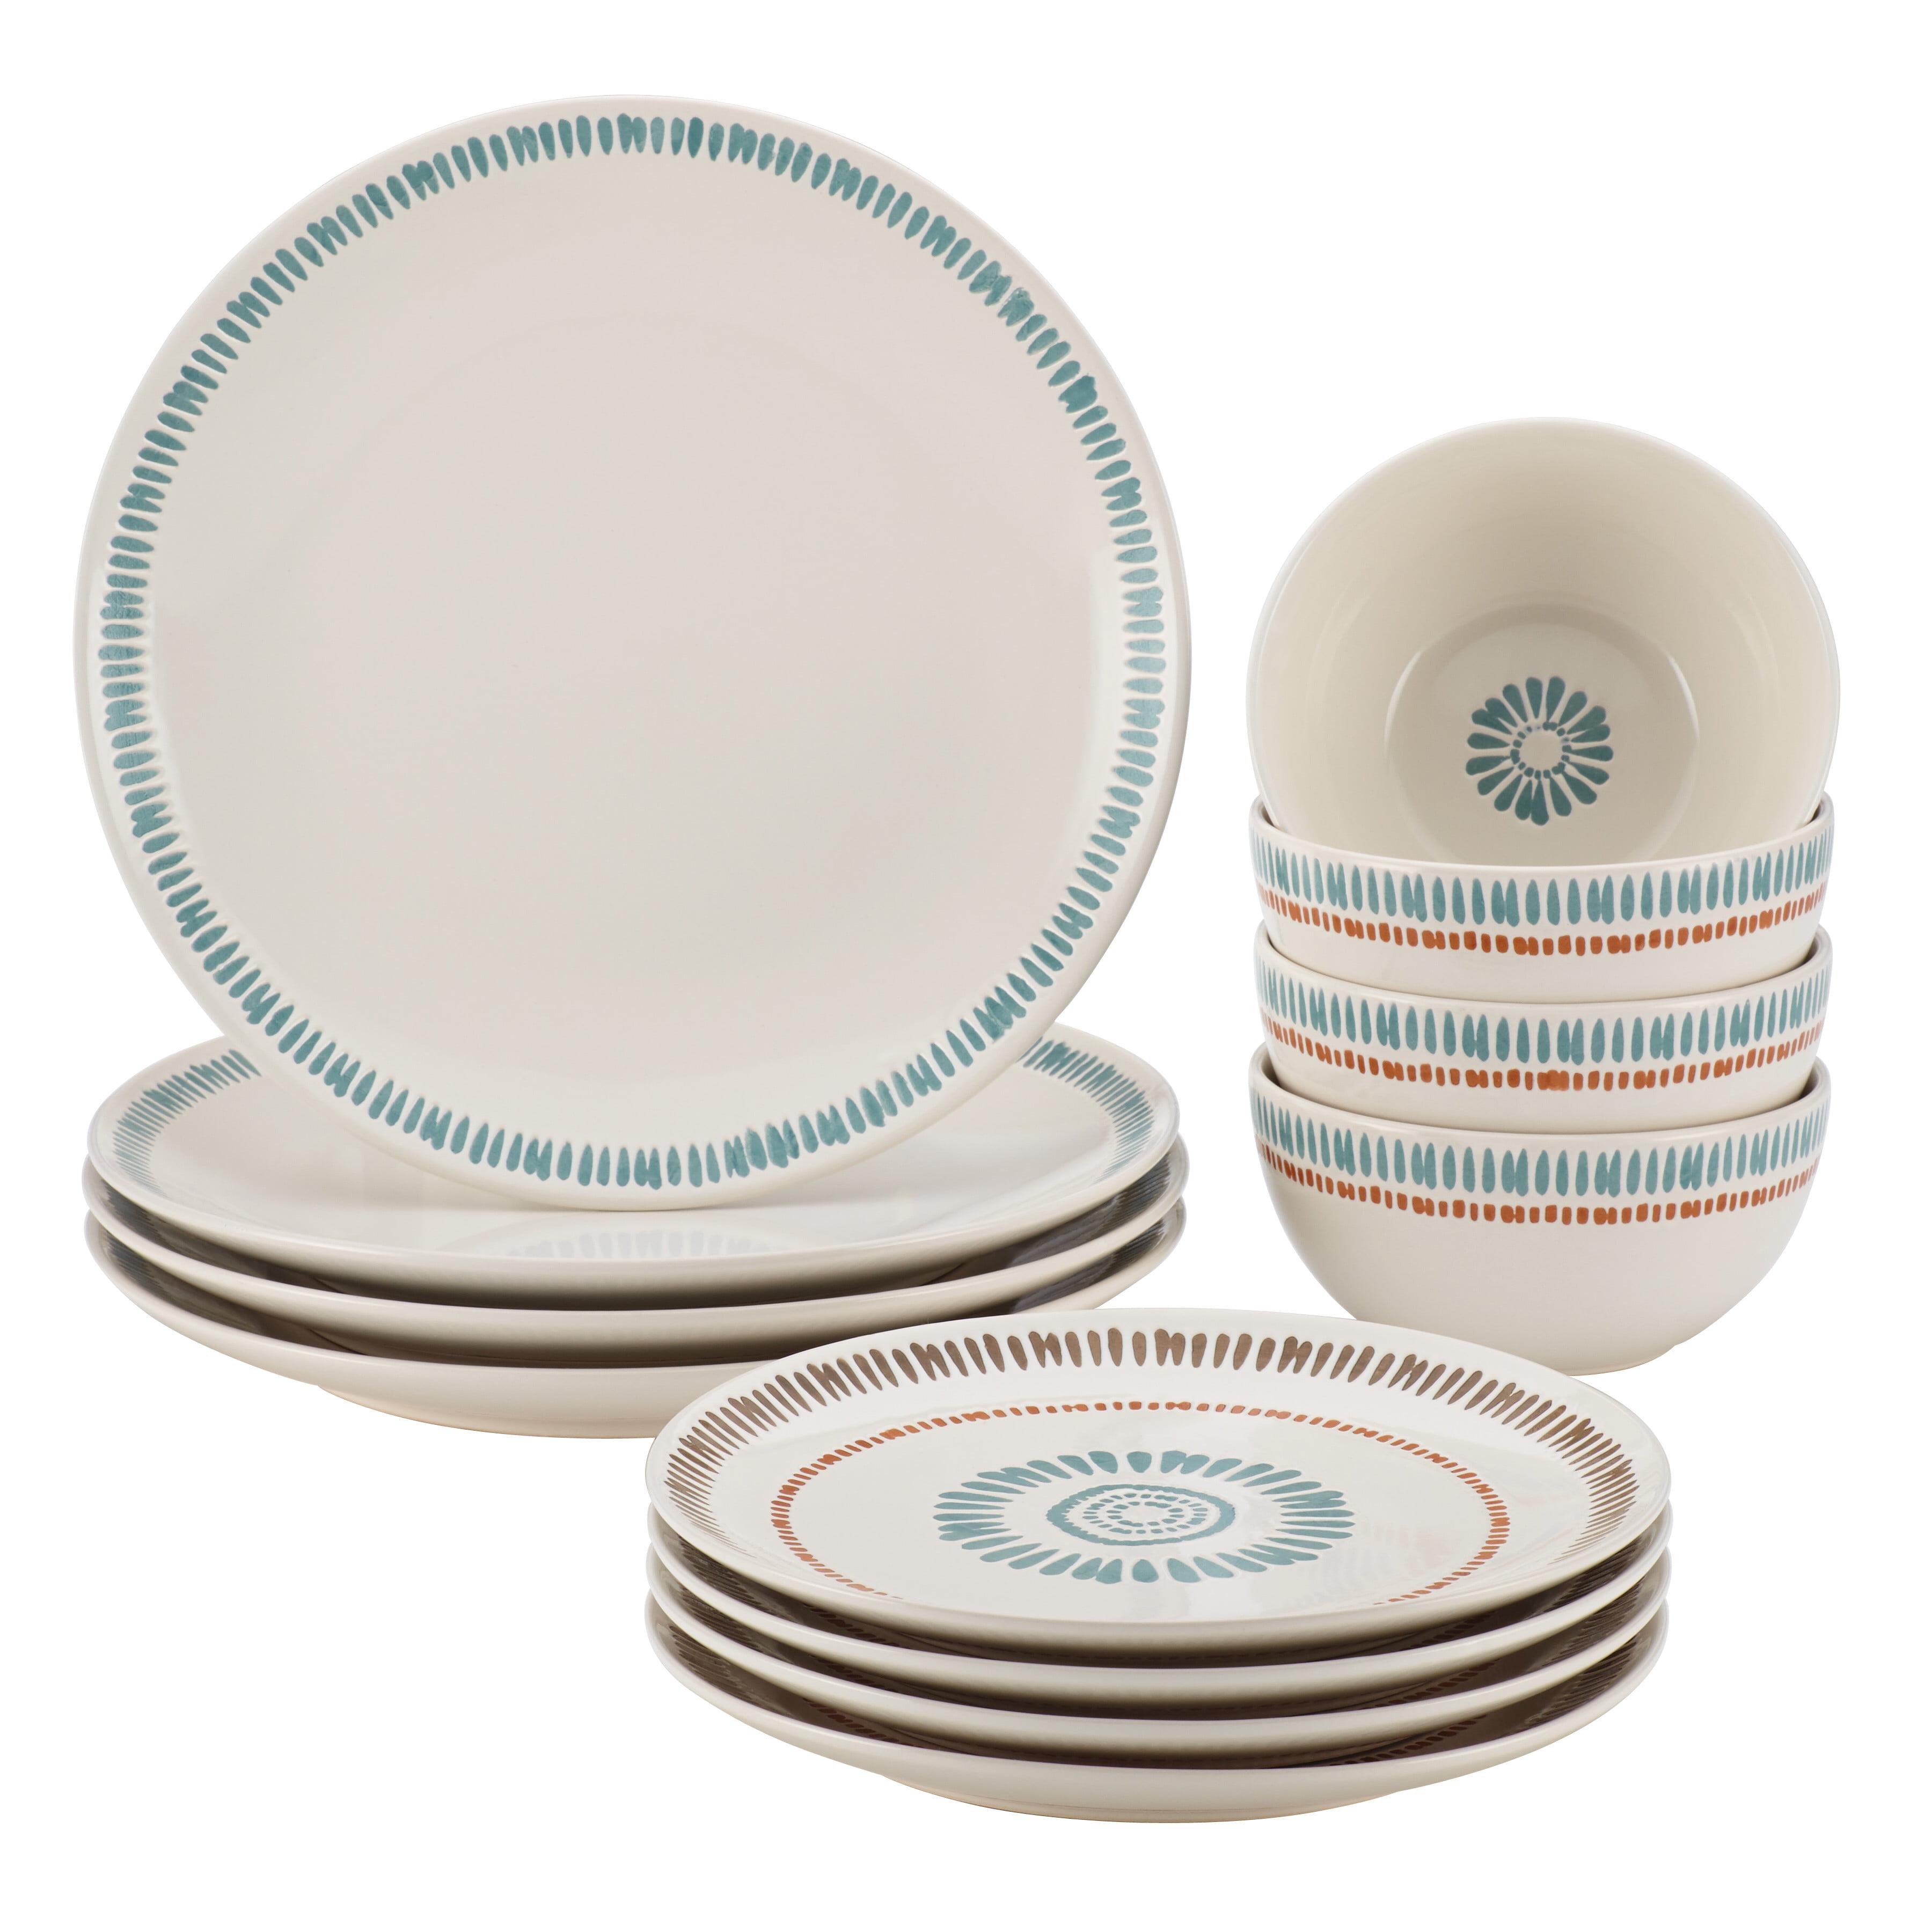 rachael ray cucina sun daisy 12piece stoneware dinnerware set print walmartcom